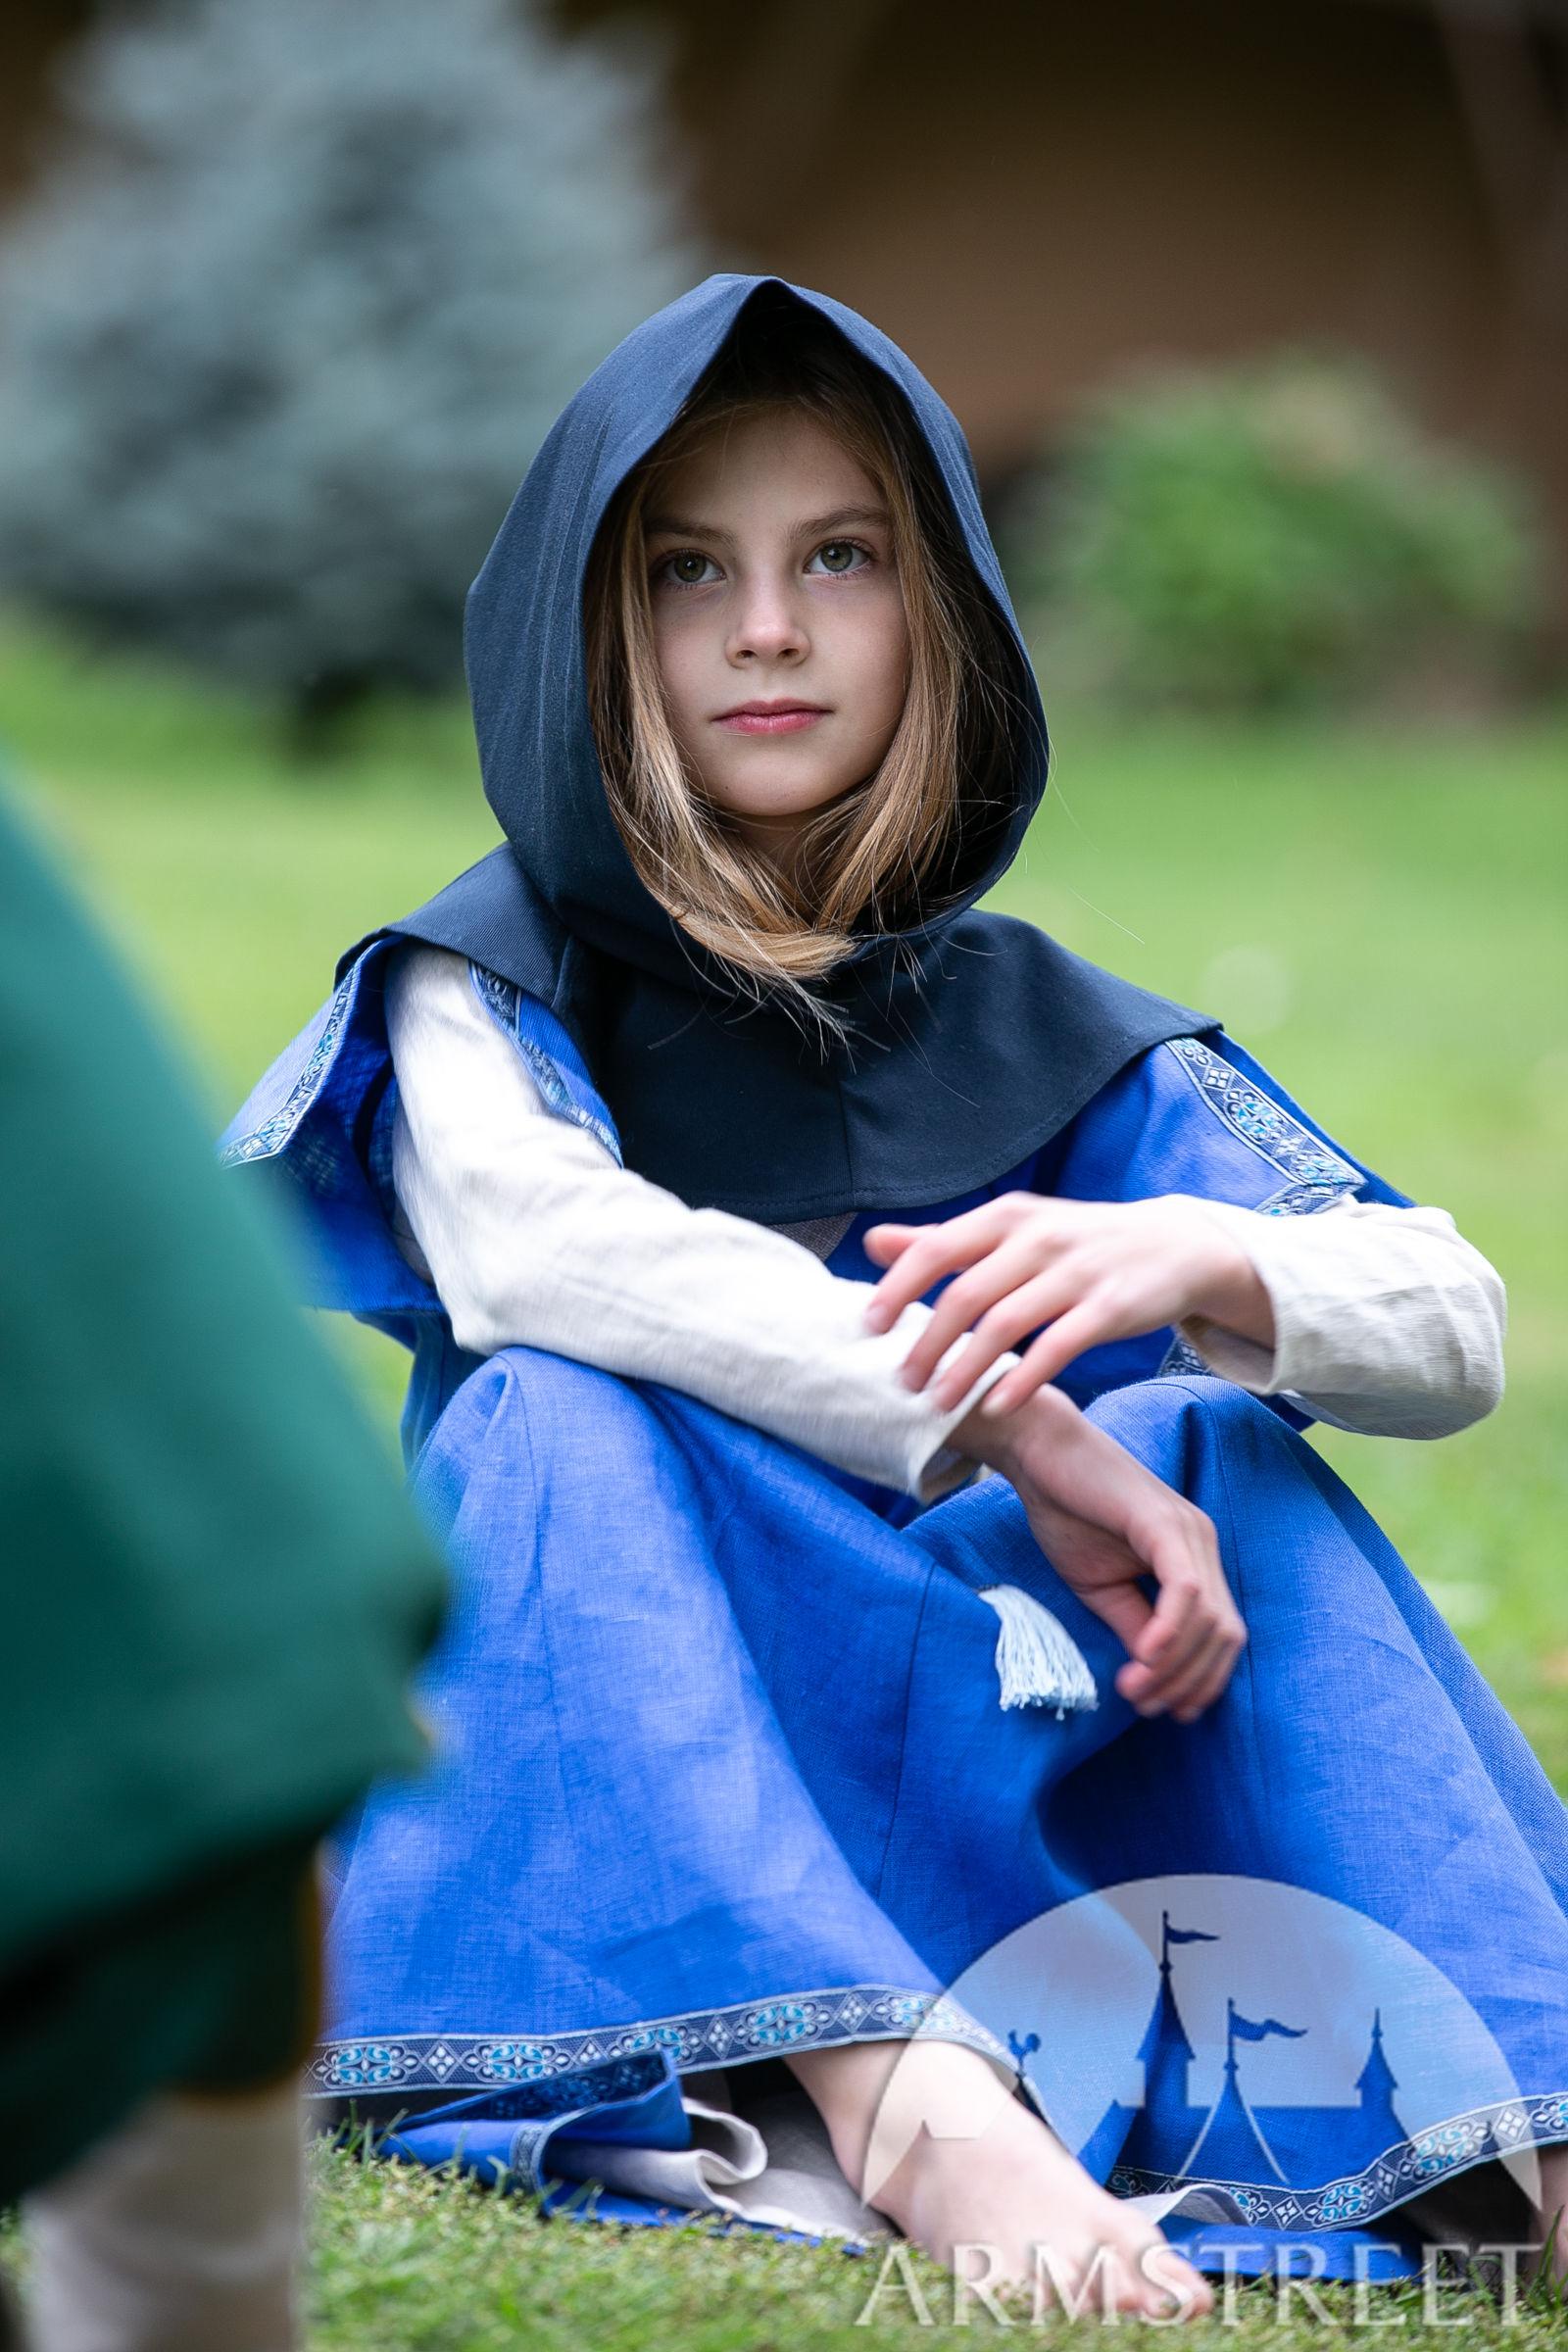 https://armstreet.com/catalogue/full/cotton-hood-for-kids-first-adventure-childrens-chaperon-4.jpg